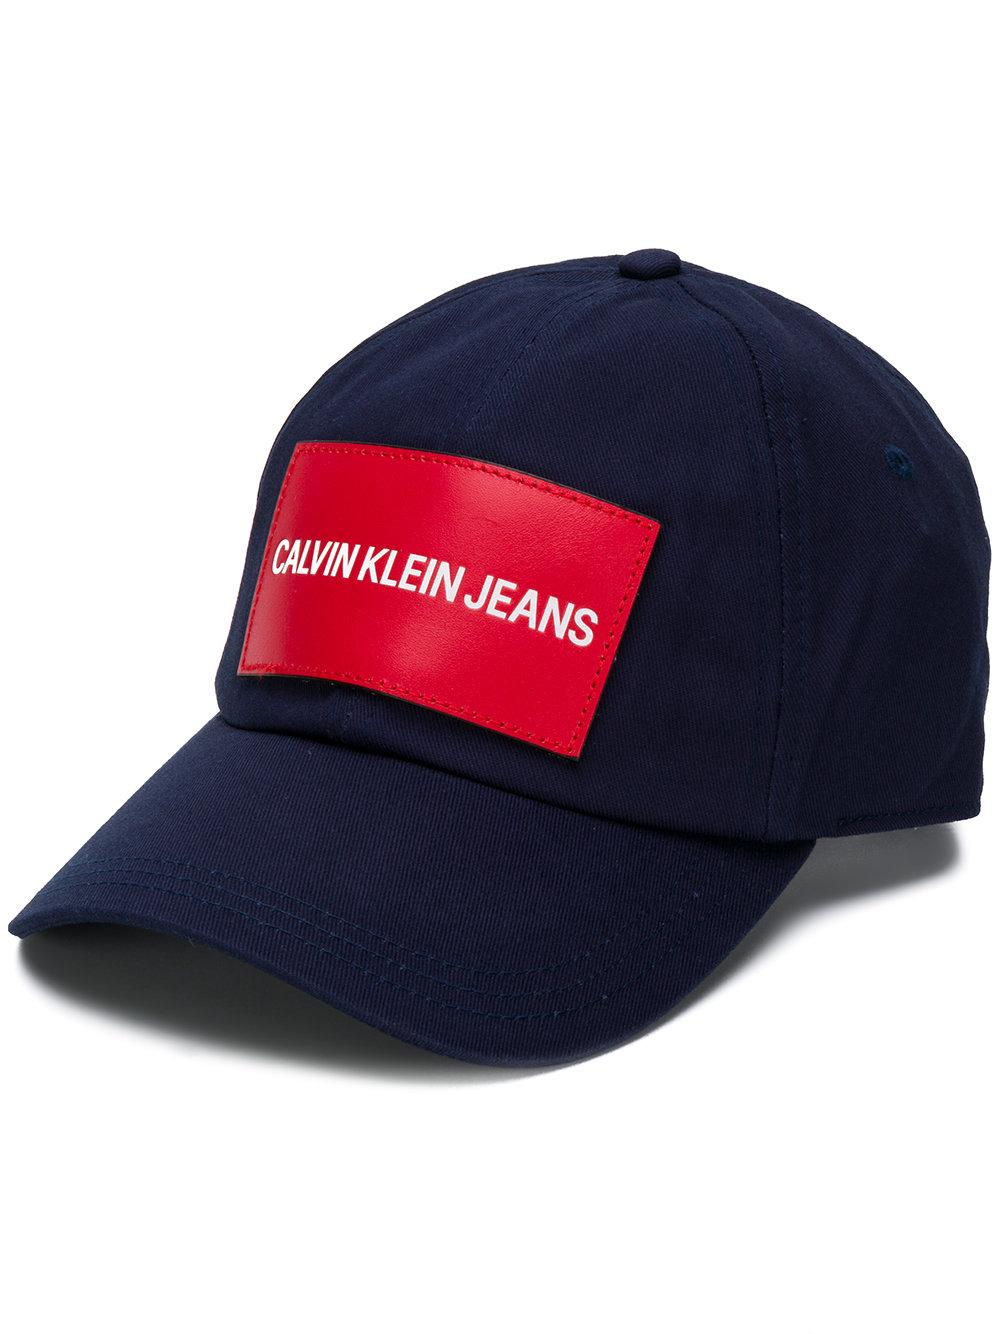 6816ce21792 Calvin Klein Jeans Logo Patch Cap